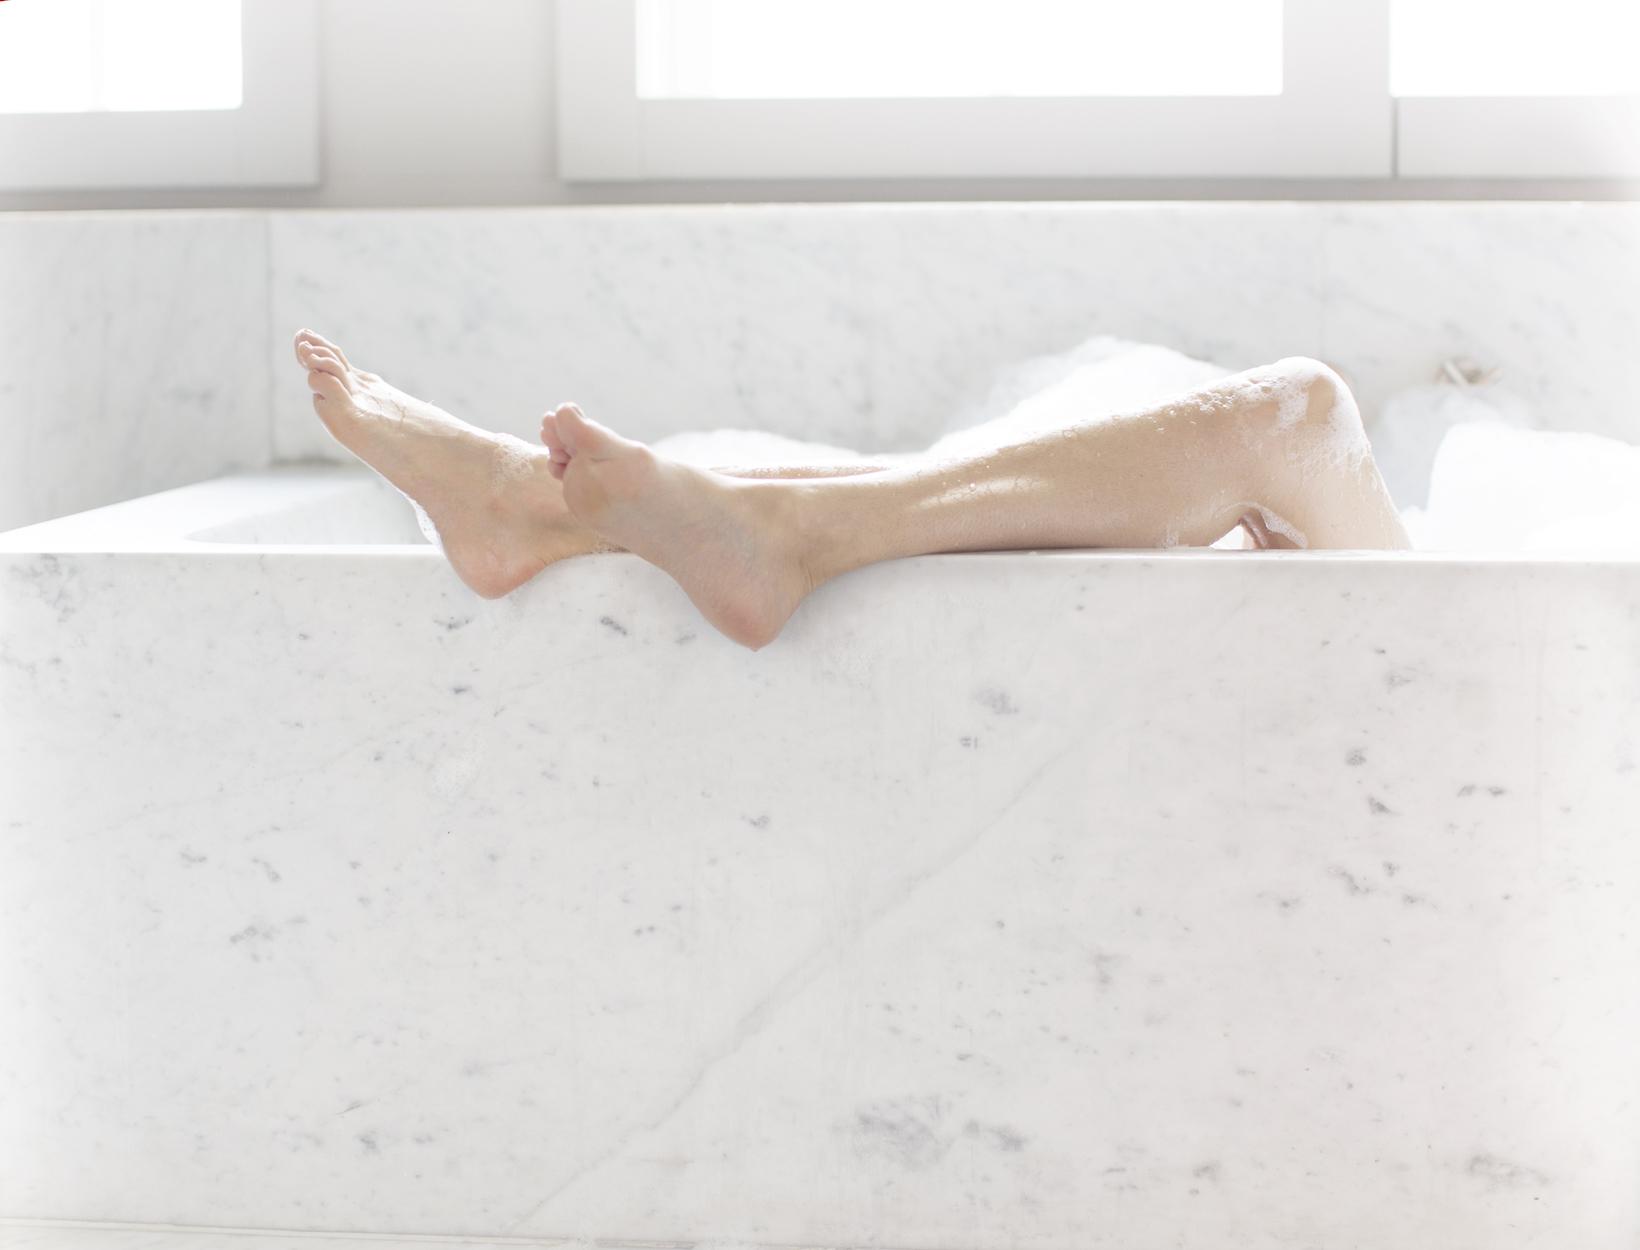 The Ultimate Bath Detox